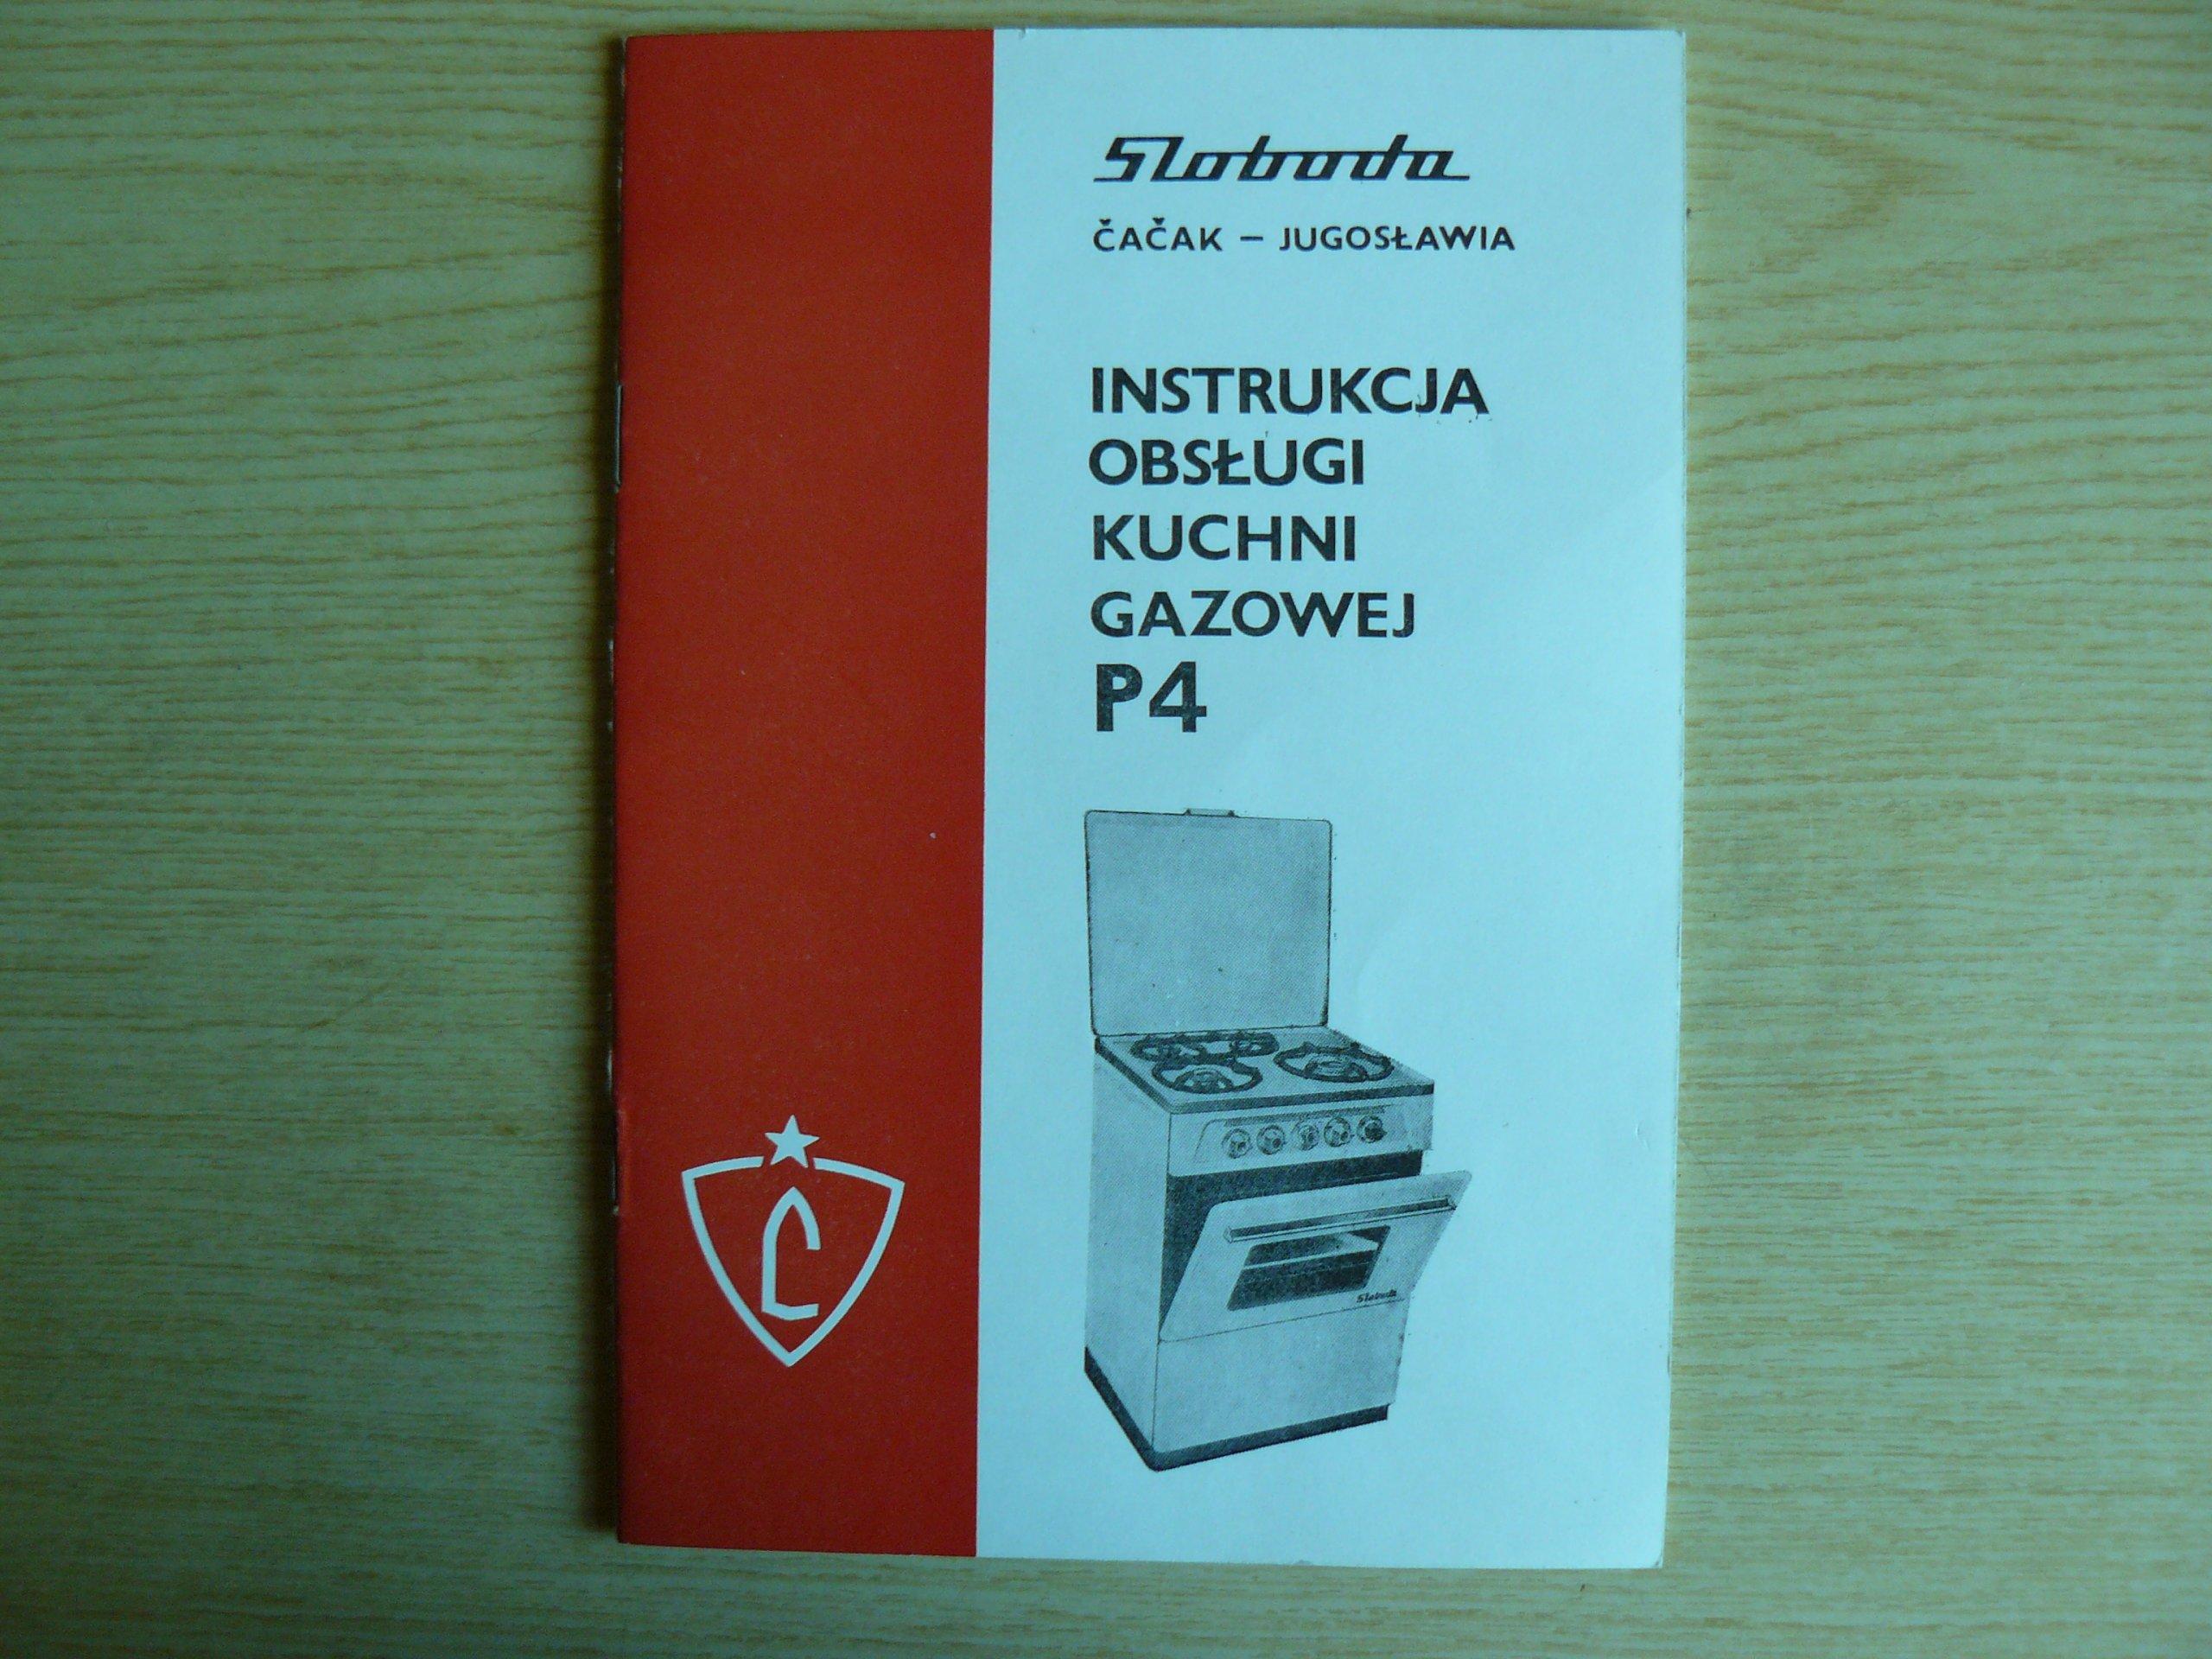 Instrukcja Obsługi Kuchni Gazowej P4